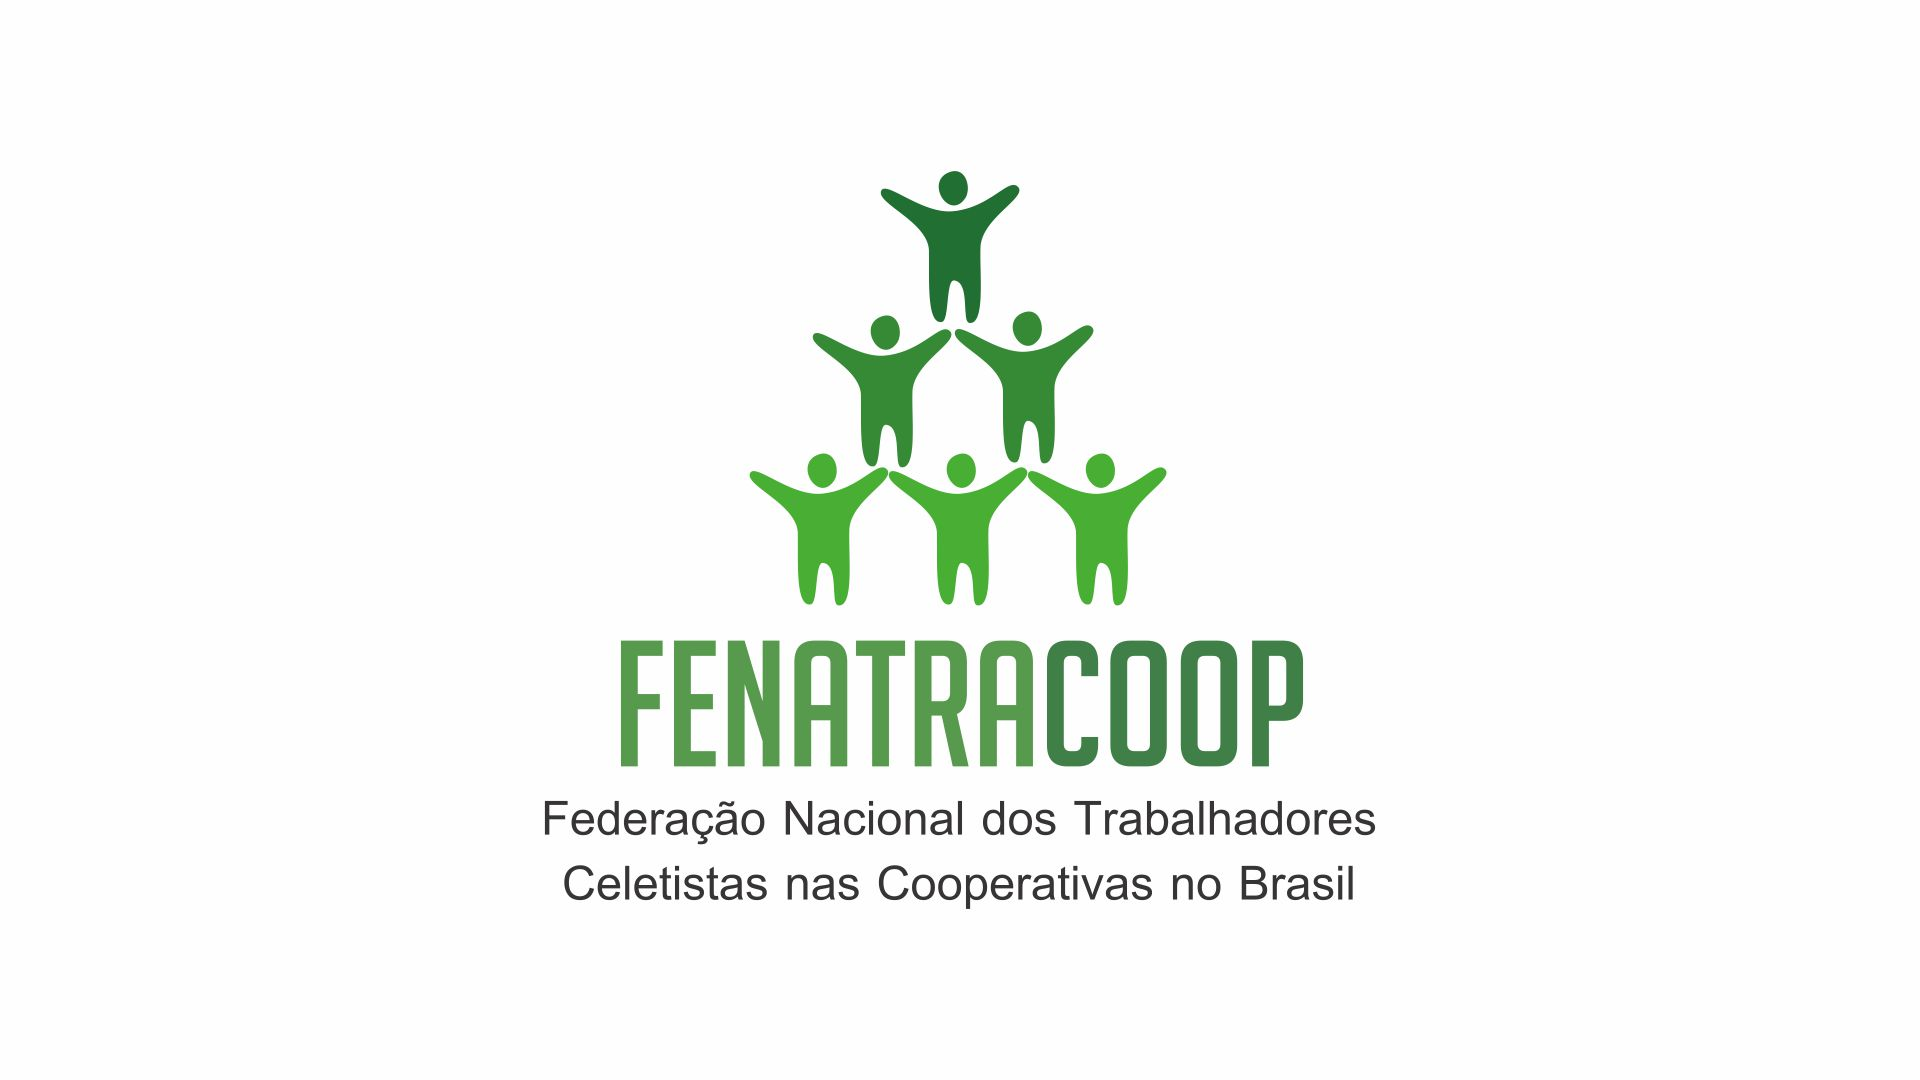 FENATRACOOP - PRESENTE EM TODO O BRASIL